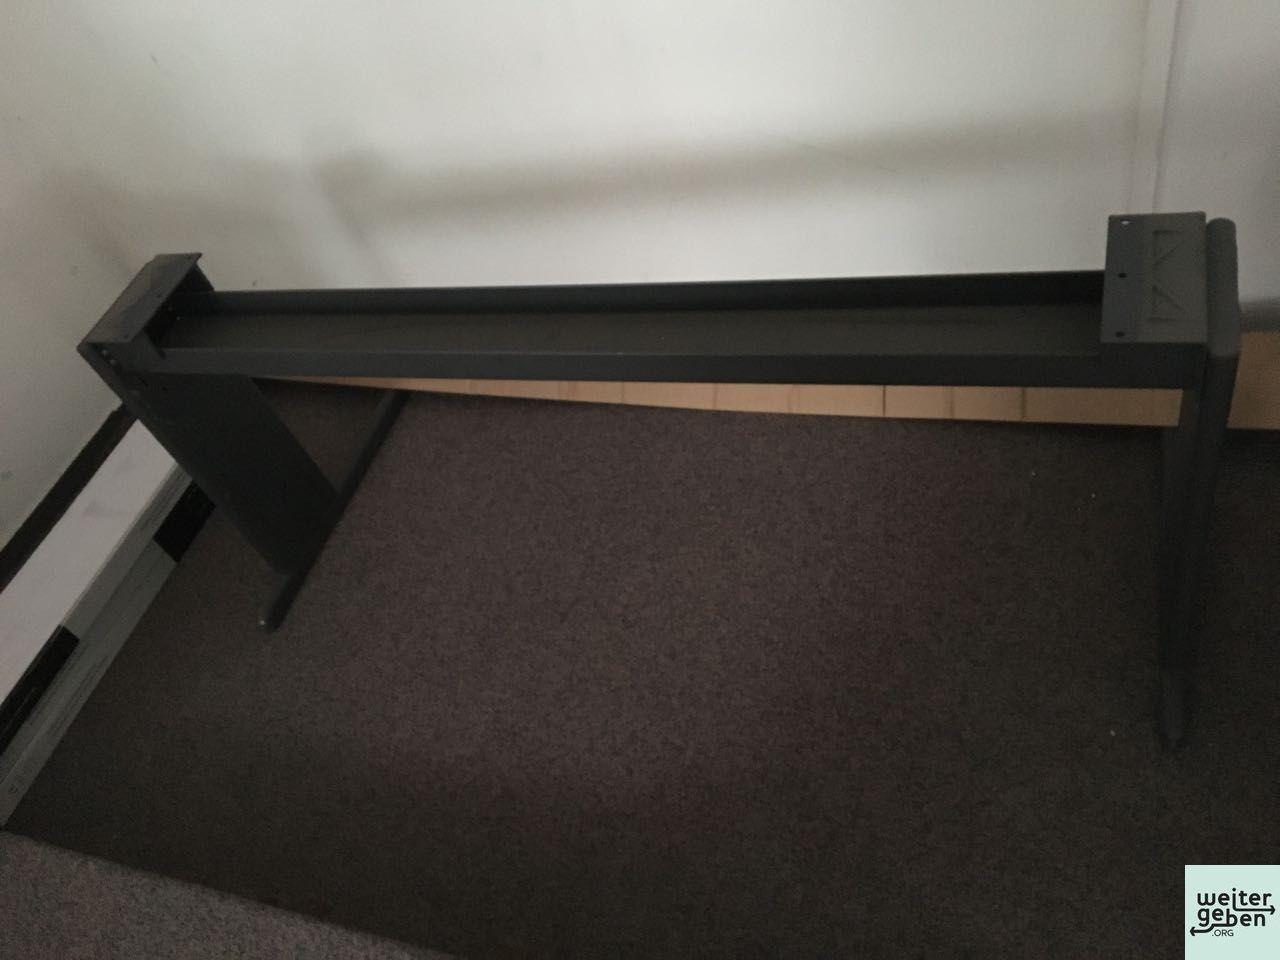 tischgestell brandenburg. Black Bedroom Furniture Sets. Home Design Ideas